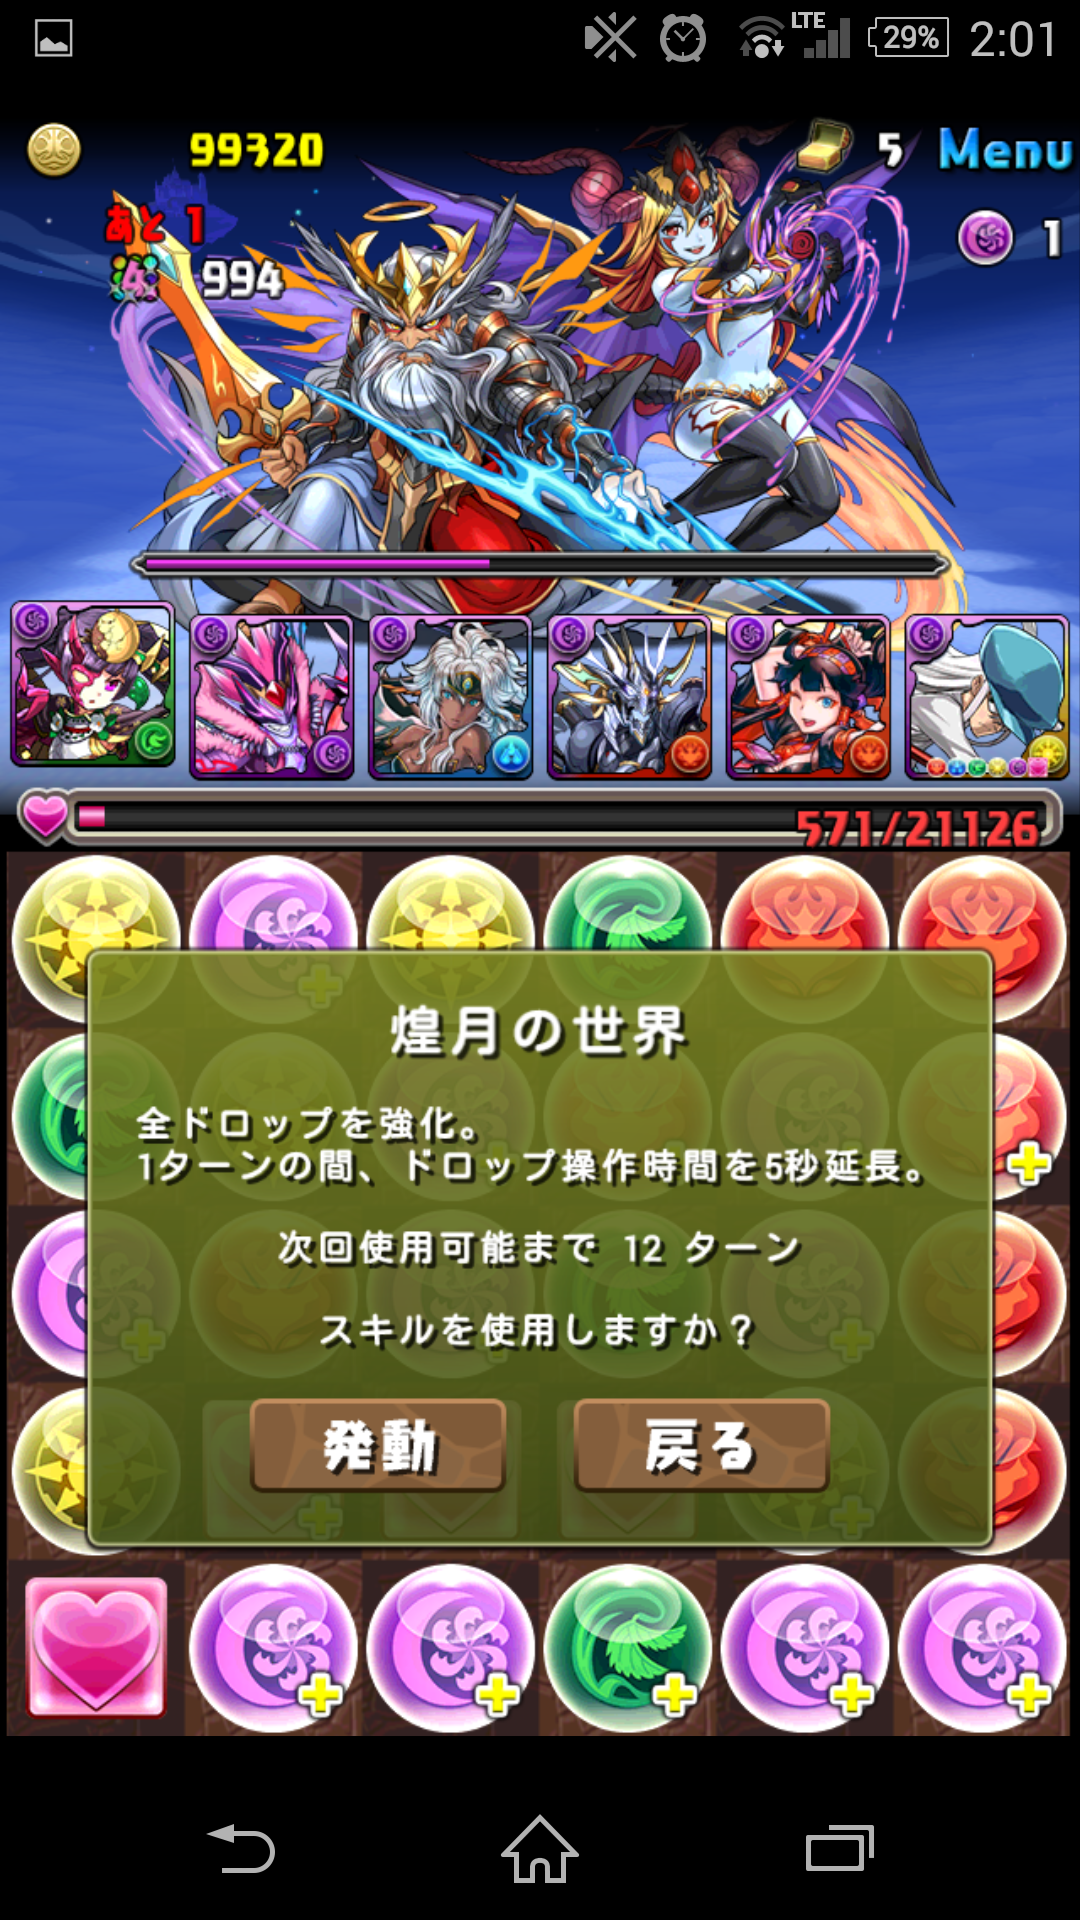 Screenshot_2015-09-01-02-01-34.png